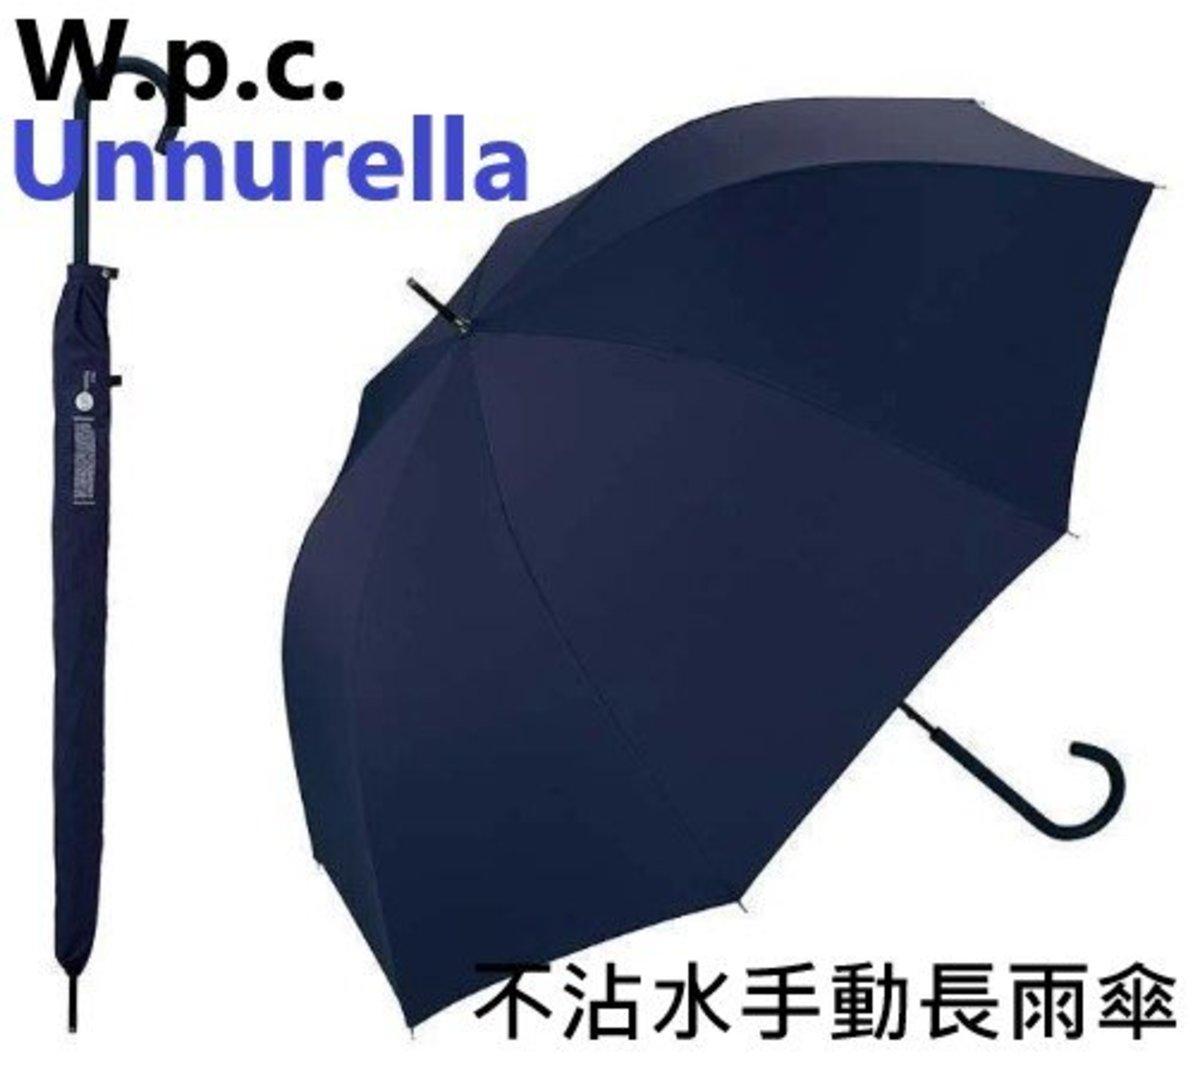 (UN-1006)Unnurella日本瞬間滴水不沾長雨傘 - 海軍藍